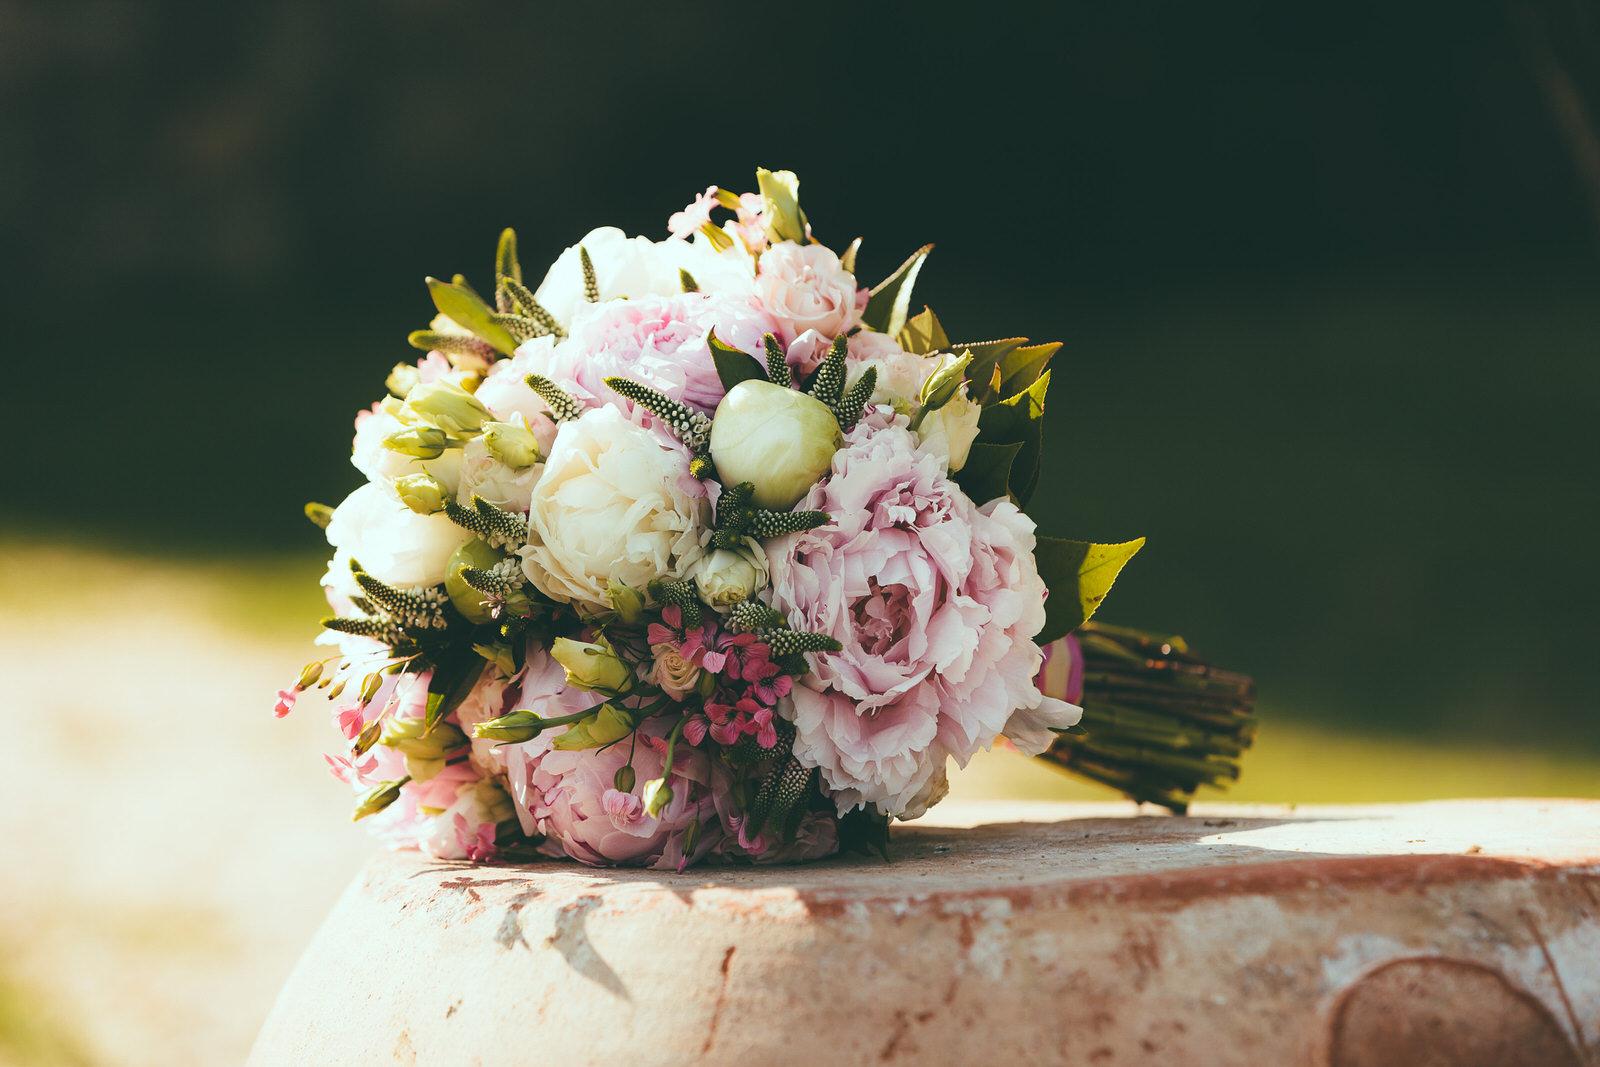 tuscany-wedding-planners-floristen-03.jpg